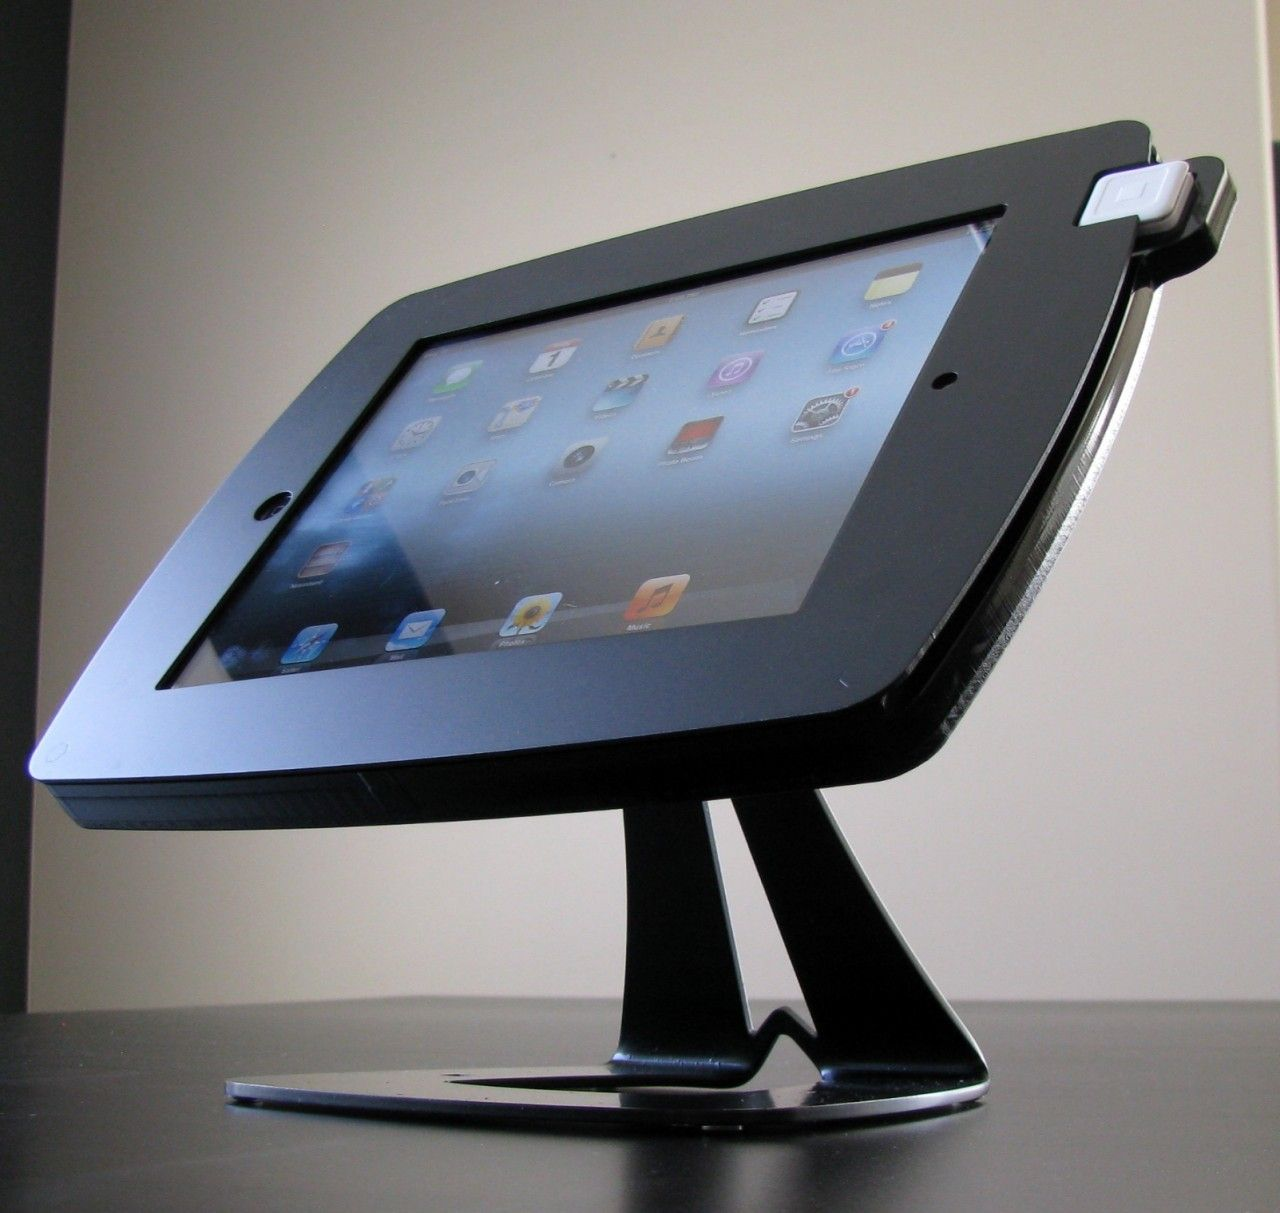 Revo swipe ipad enclosure black swipe card ipad